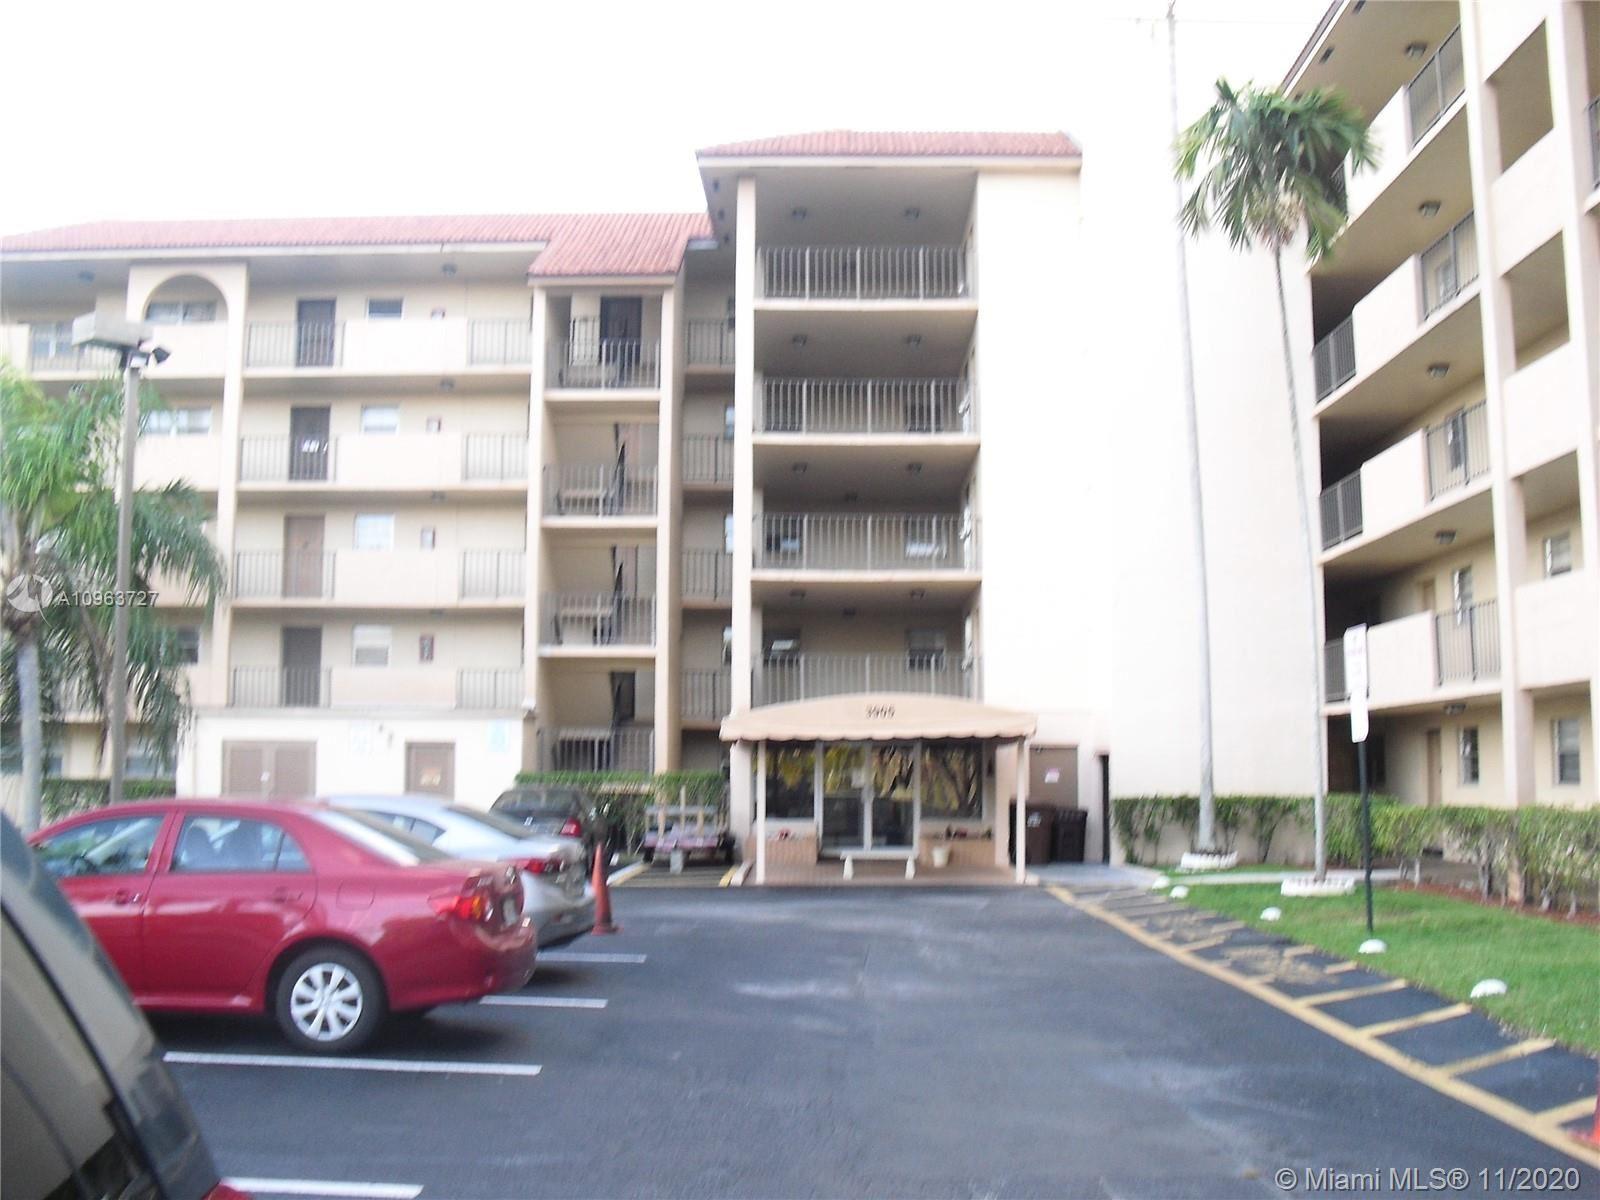 3905 N NOB HILL RD #301, Sunrise, FL 33351 - #: A10963727